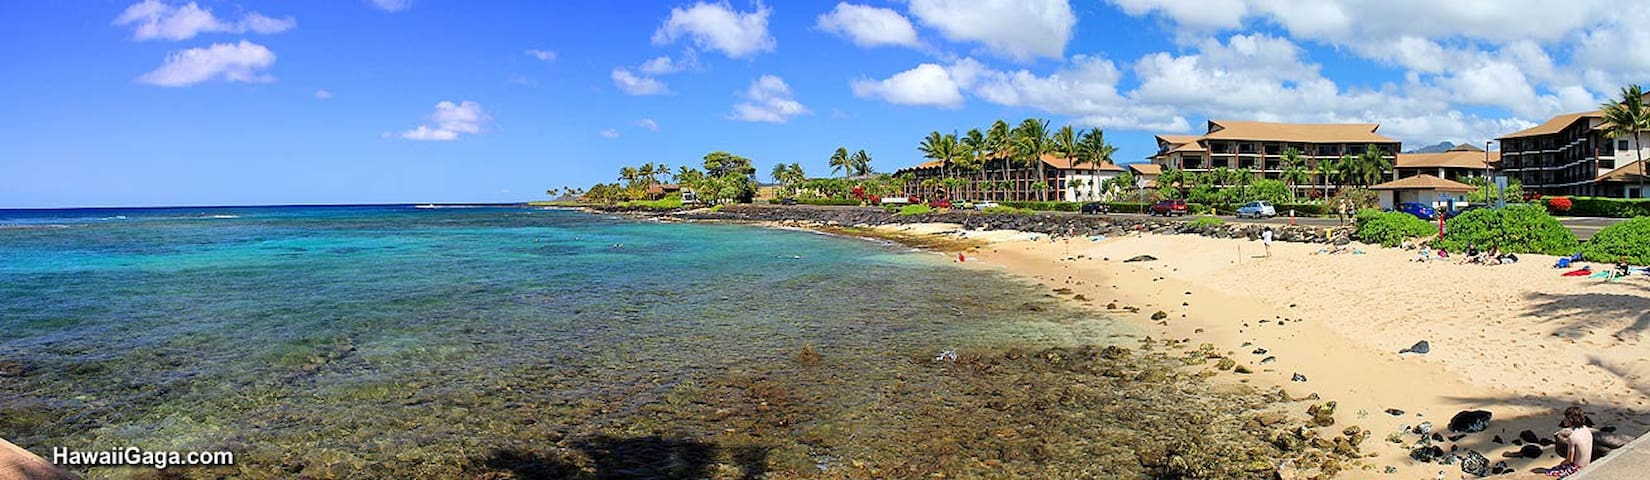 Lawai Beach Resort, 1 bdrm, Fully Furnished Condo - Koloa - Multipropietat (timeshare)